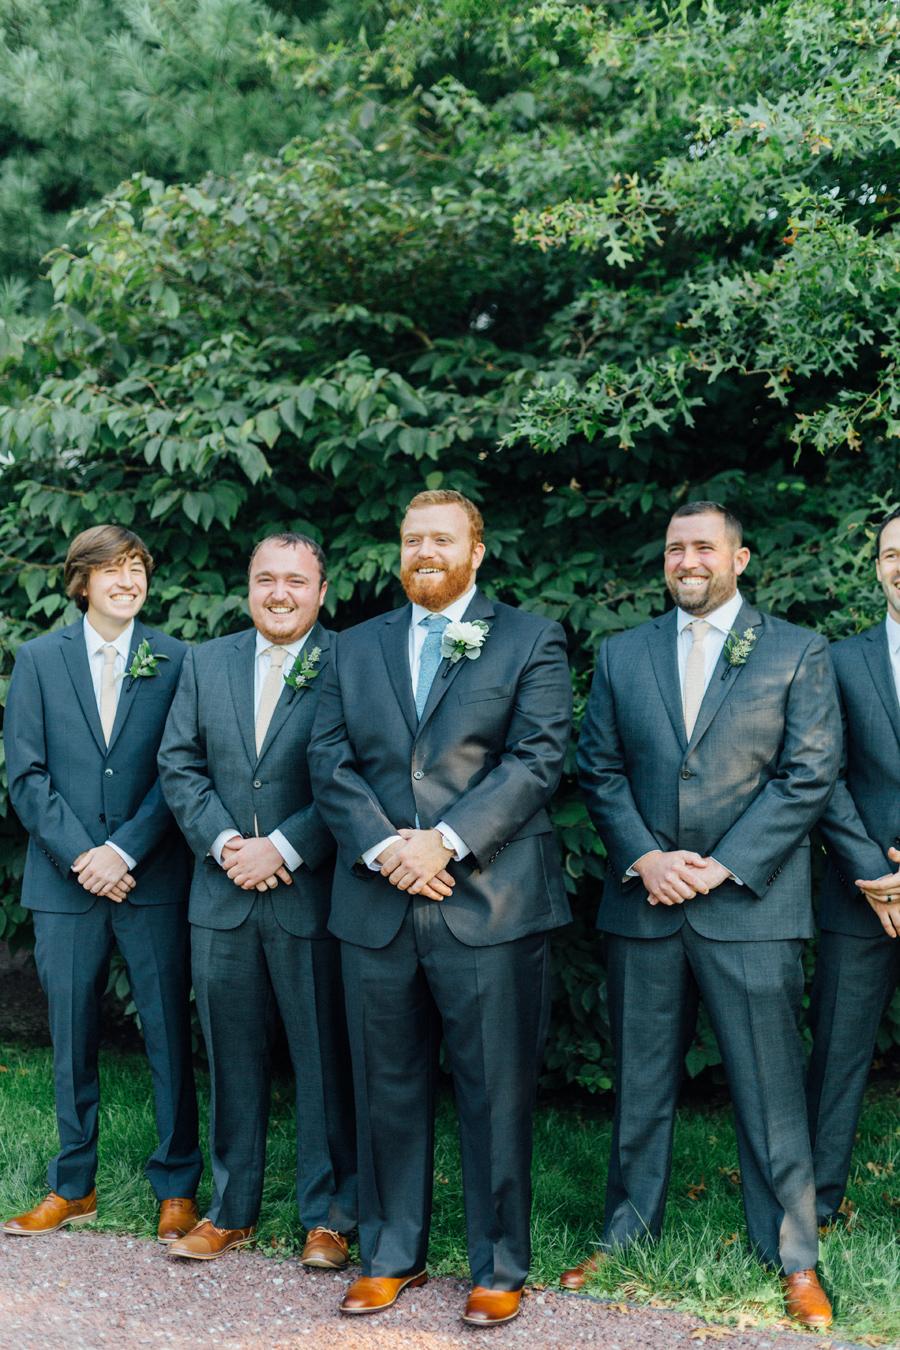 the-inn-at-leola-wedding-lancaster-pennsylvania-wedding-photographer-rebeka-viola-photograhy (40).jpg